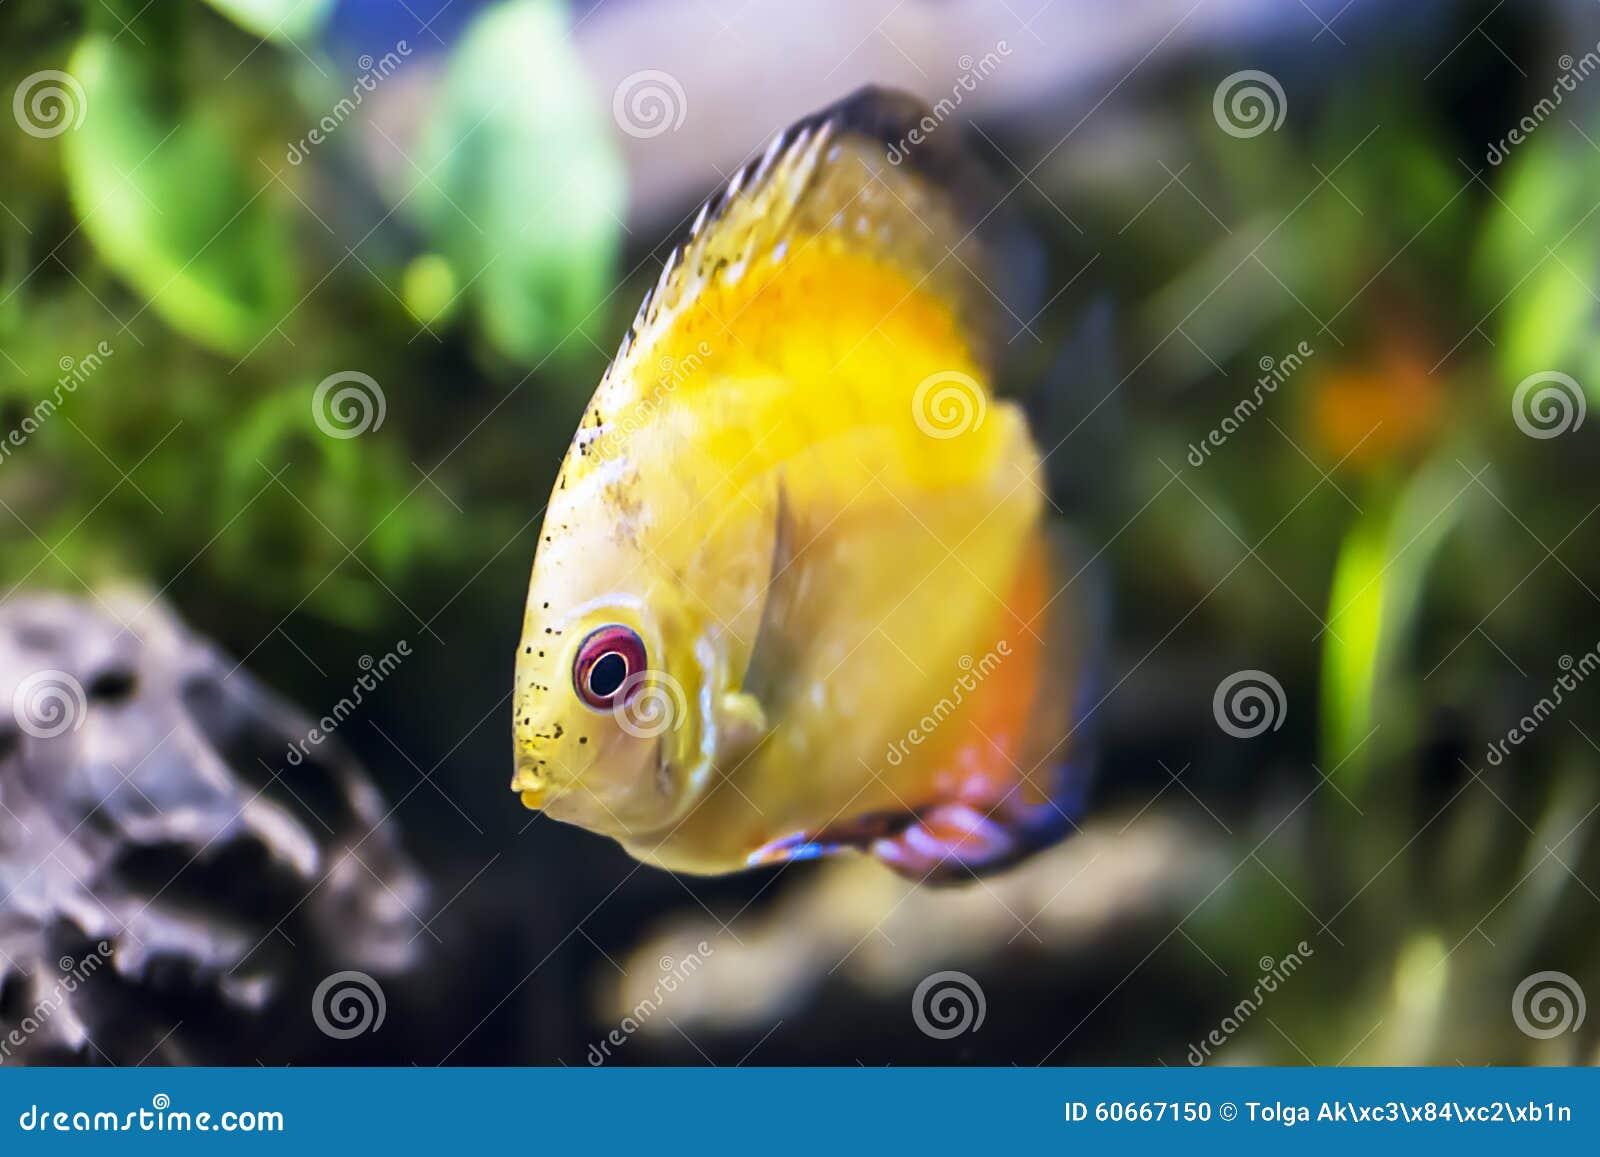 Symphsodon Aequifasciatus Stock Photo Image 60667150